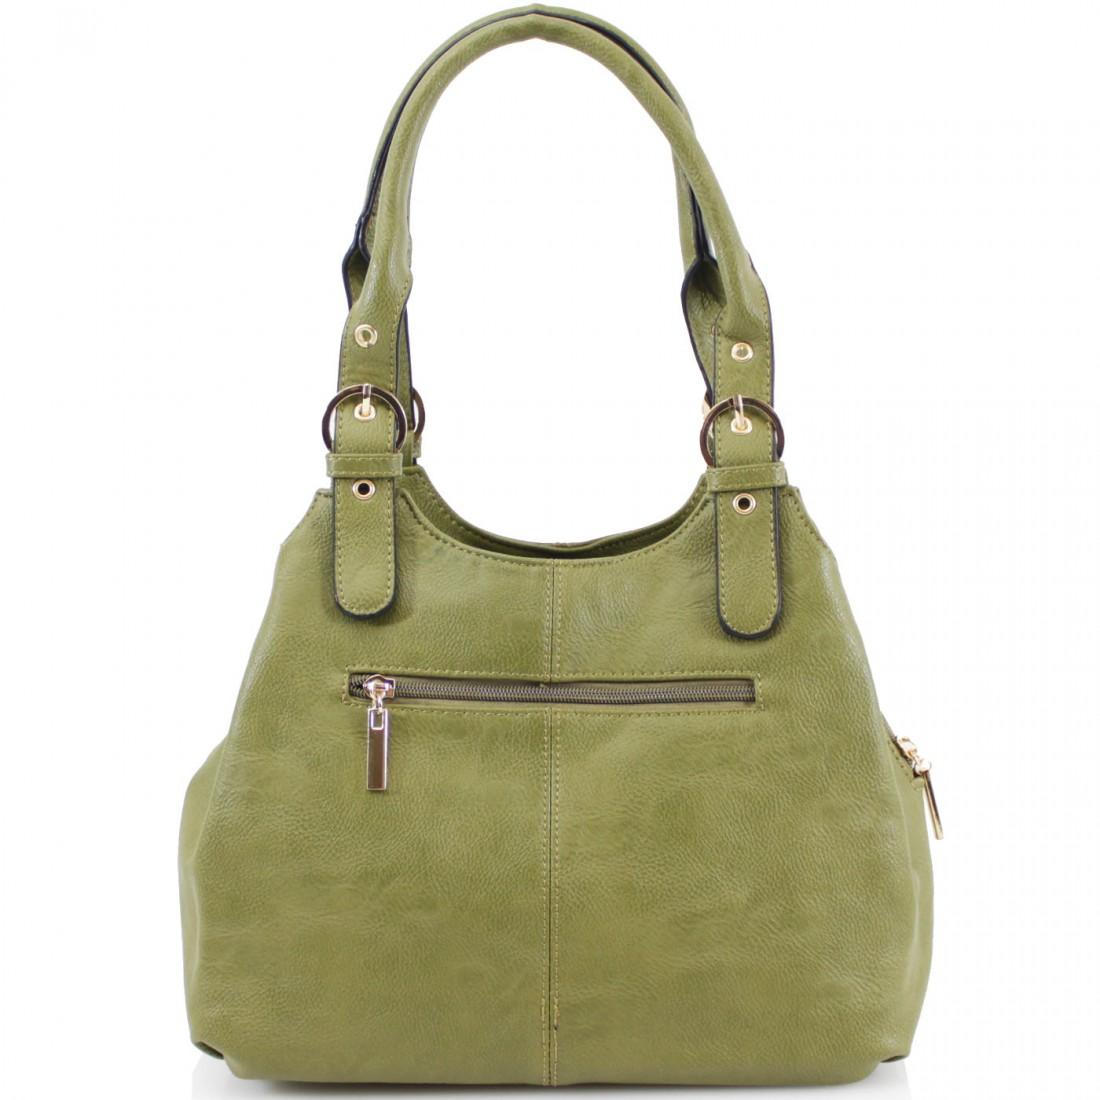 3 Section Buckle Bag - Khaki